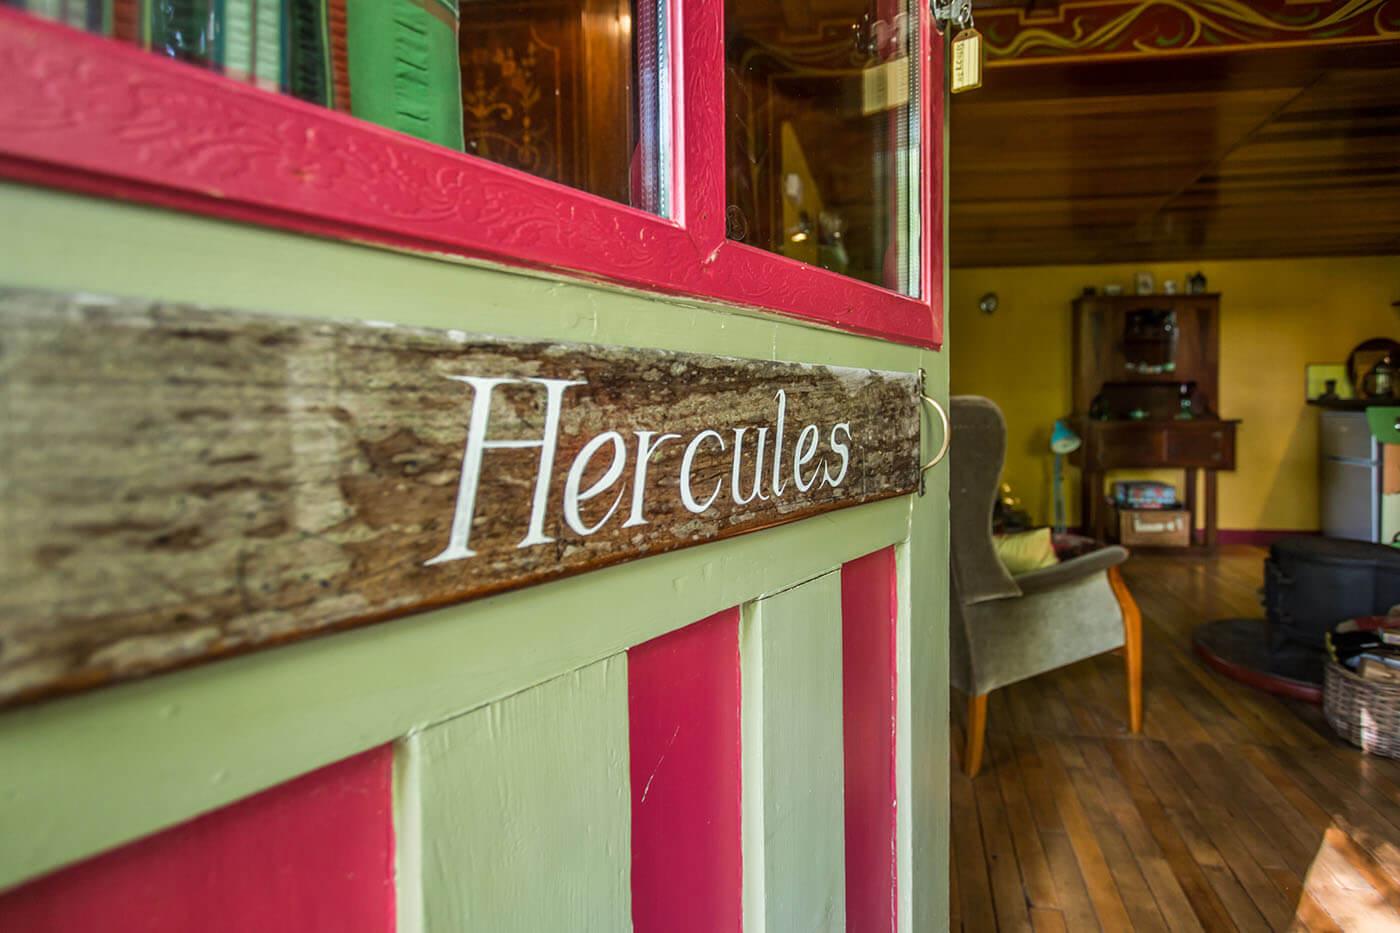 Spring Park Hercules